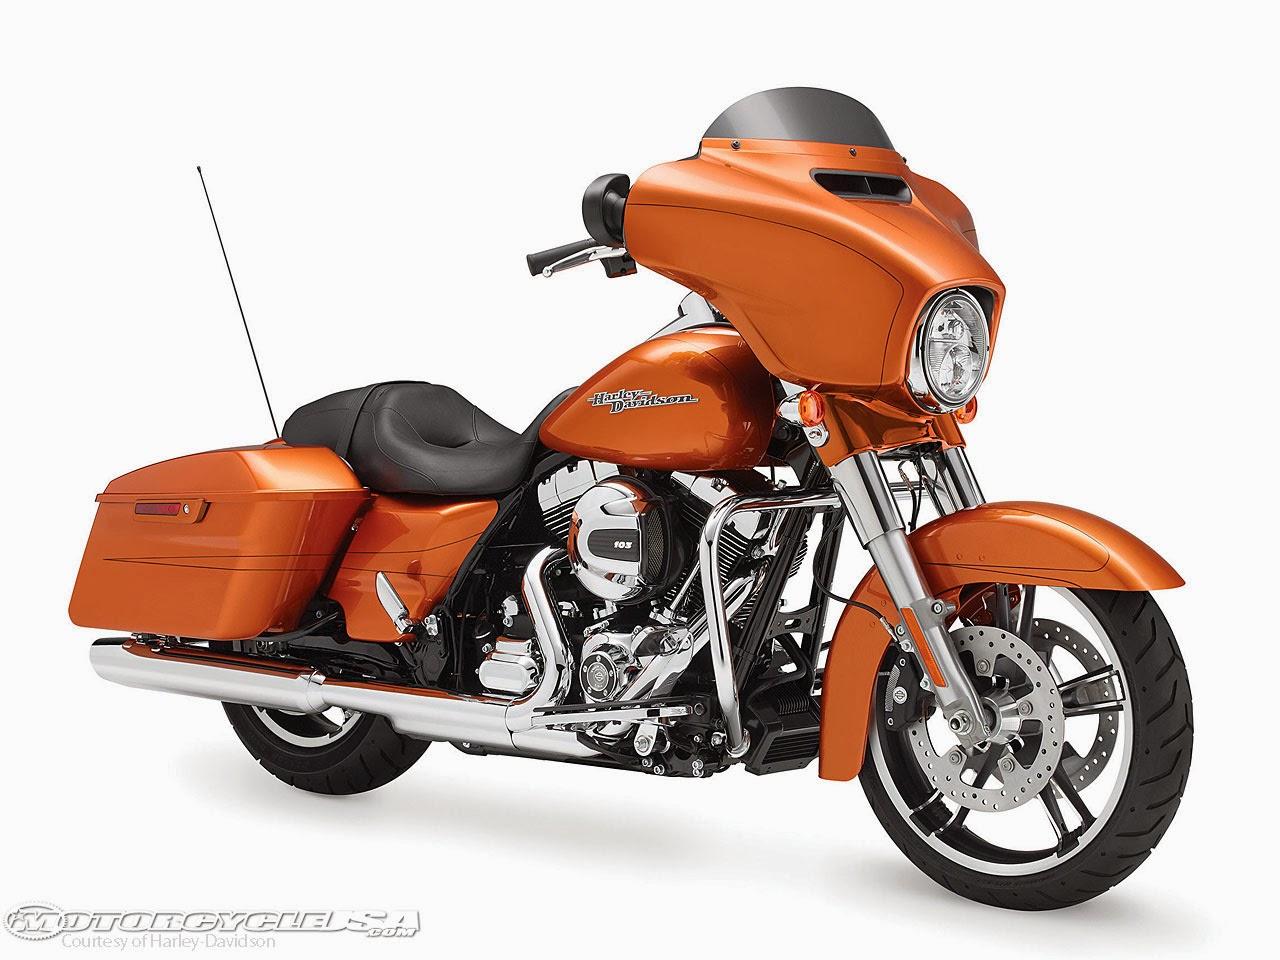 harley davidson flhx street glide all motorcycles in the world. Black Bedroom Furniture Sets. Home Design Ideas